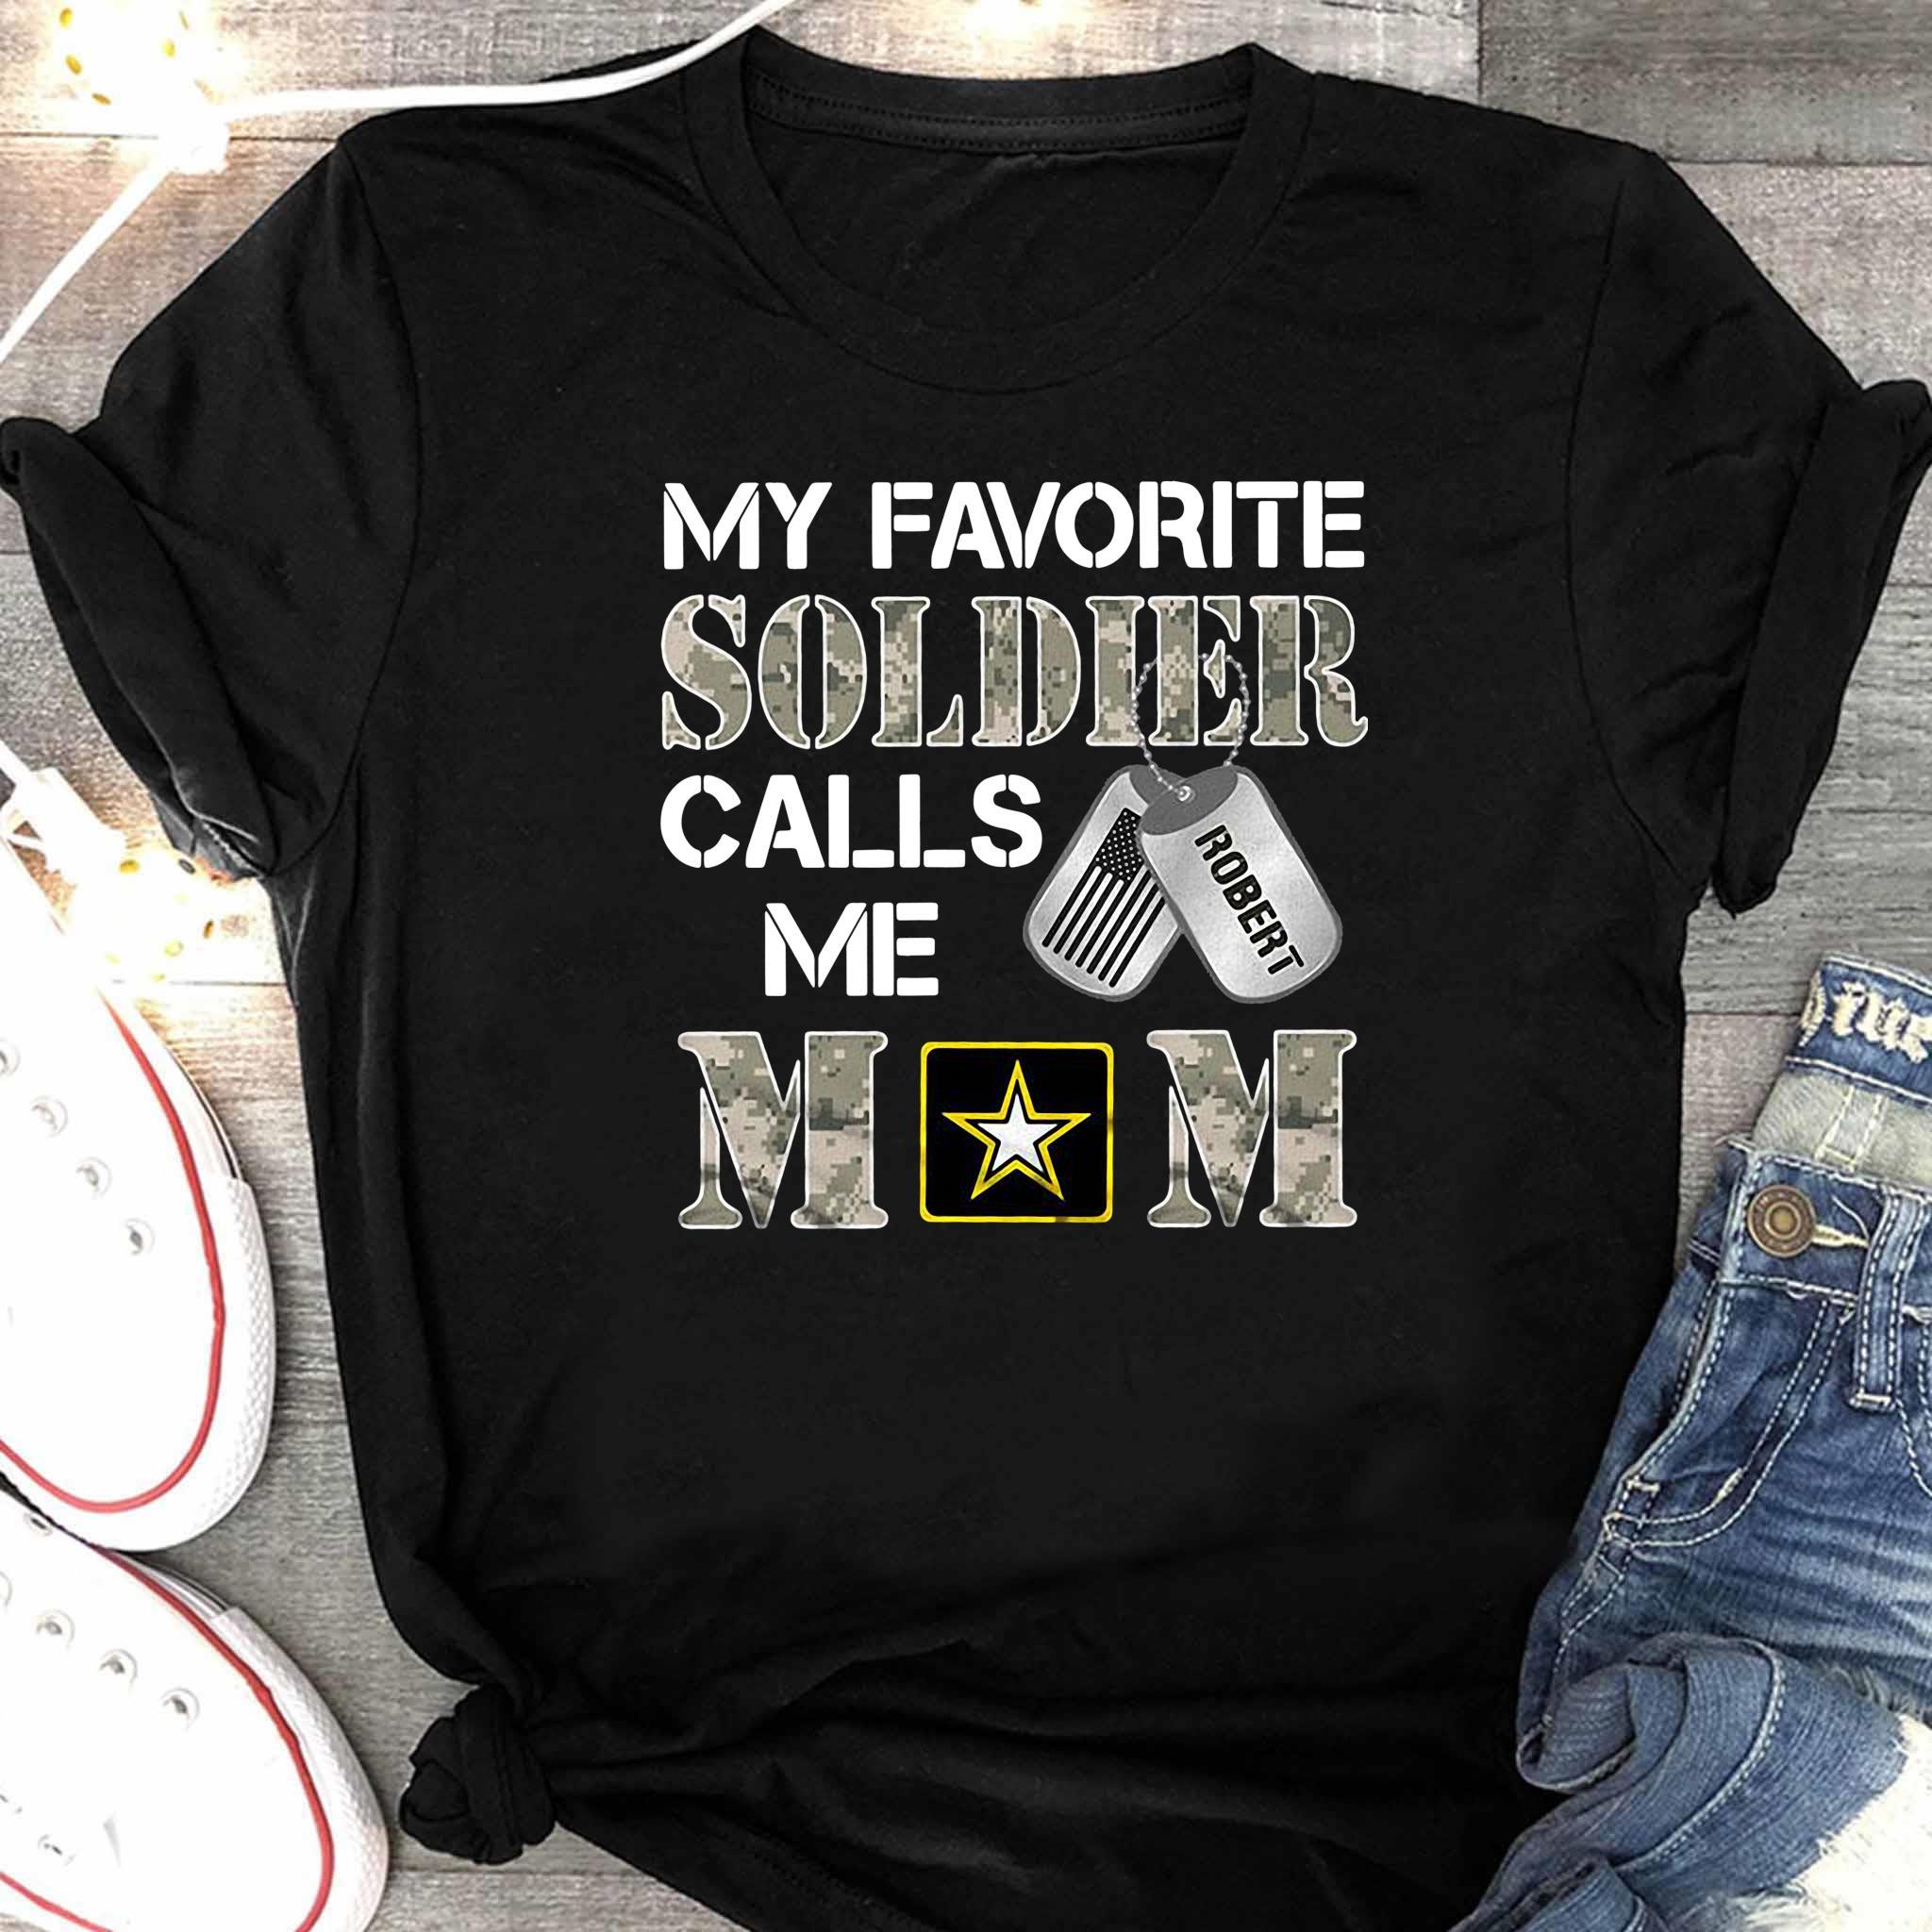 My Favorite Soldier Calls Me Mom Shirt Women's Shirt